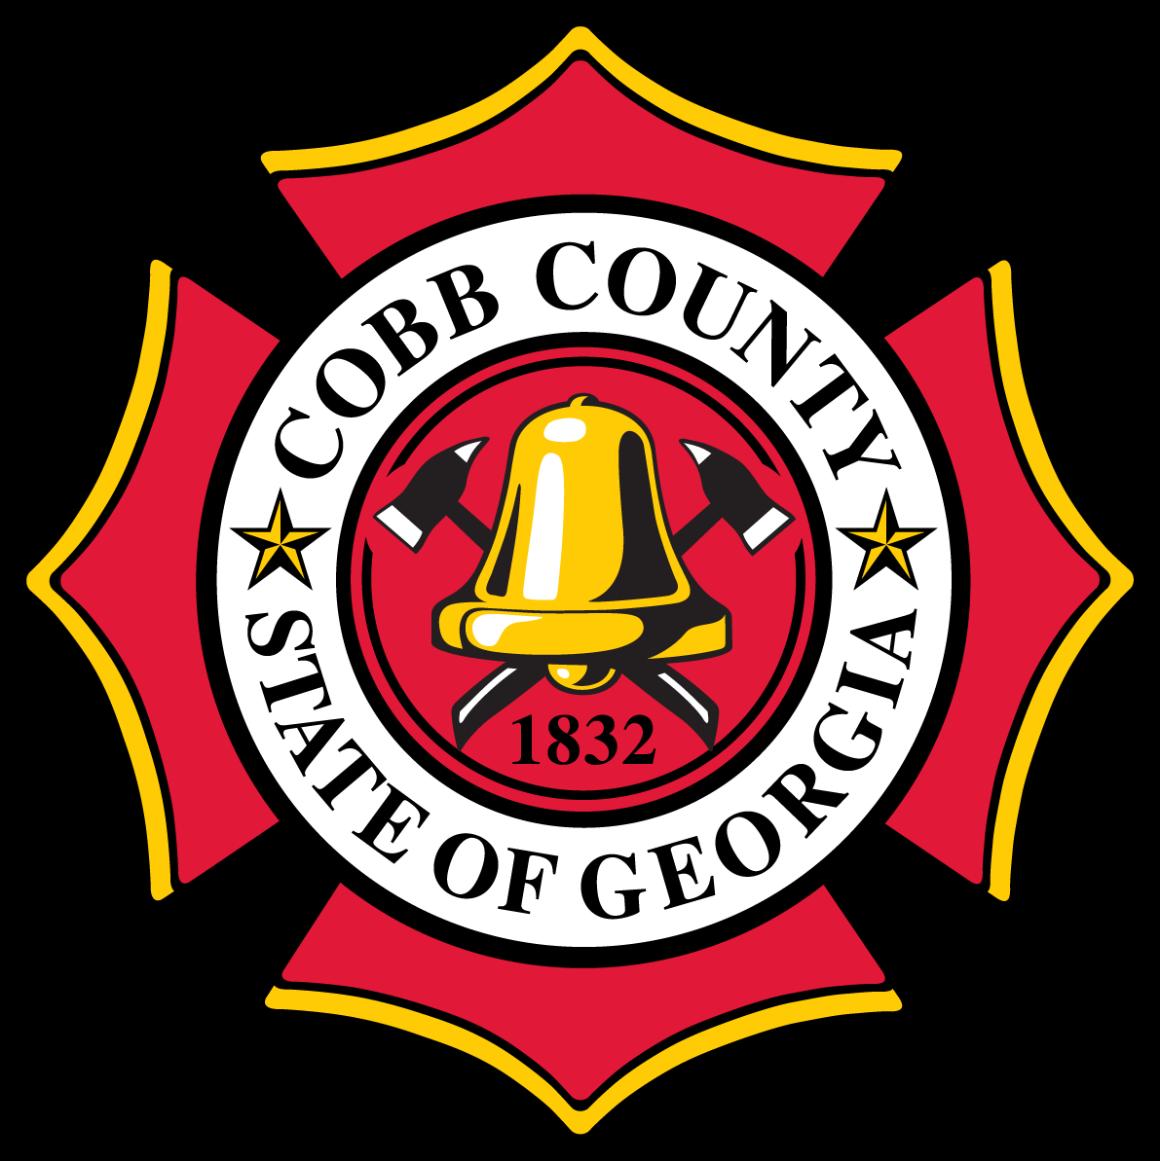 Fireman clipart badge. Fire department home we